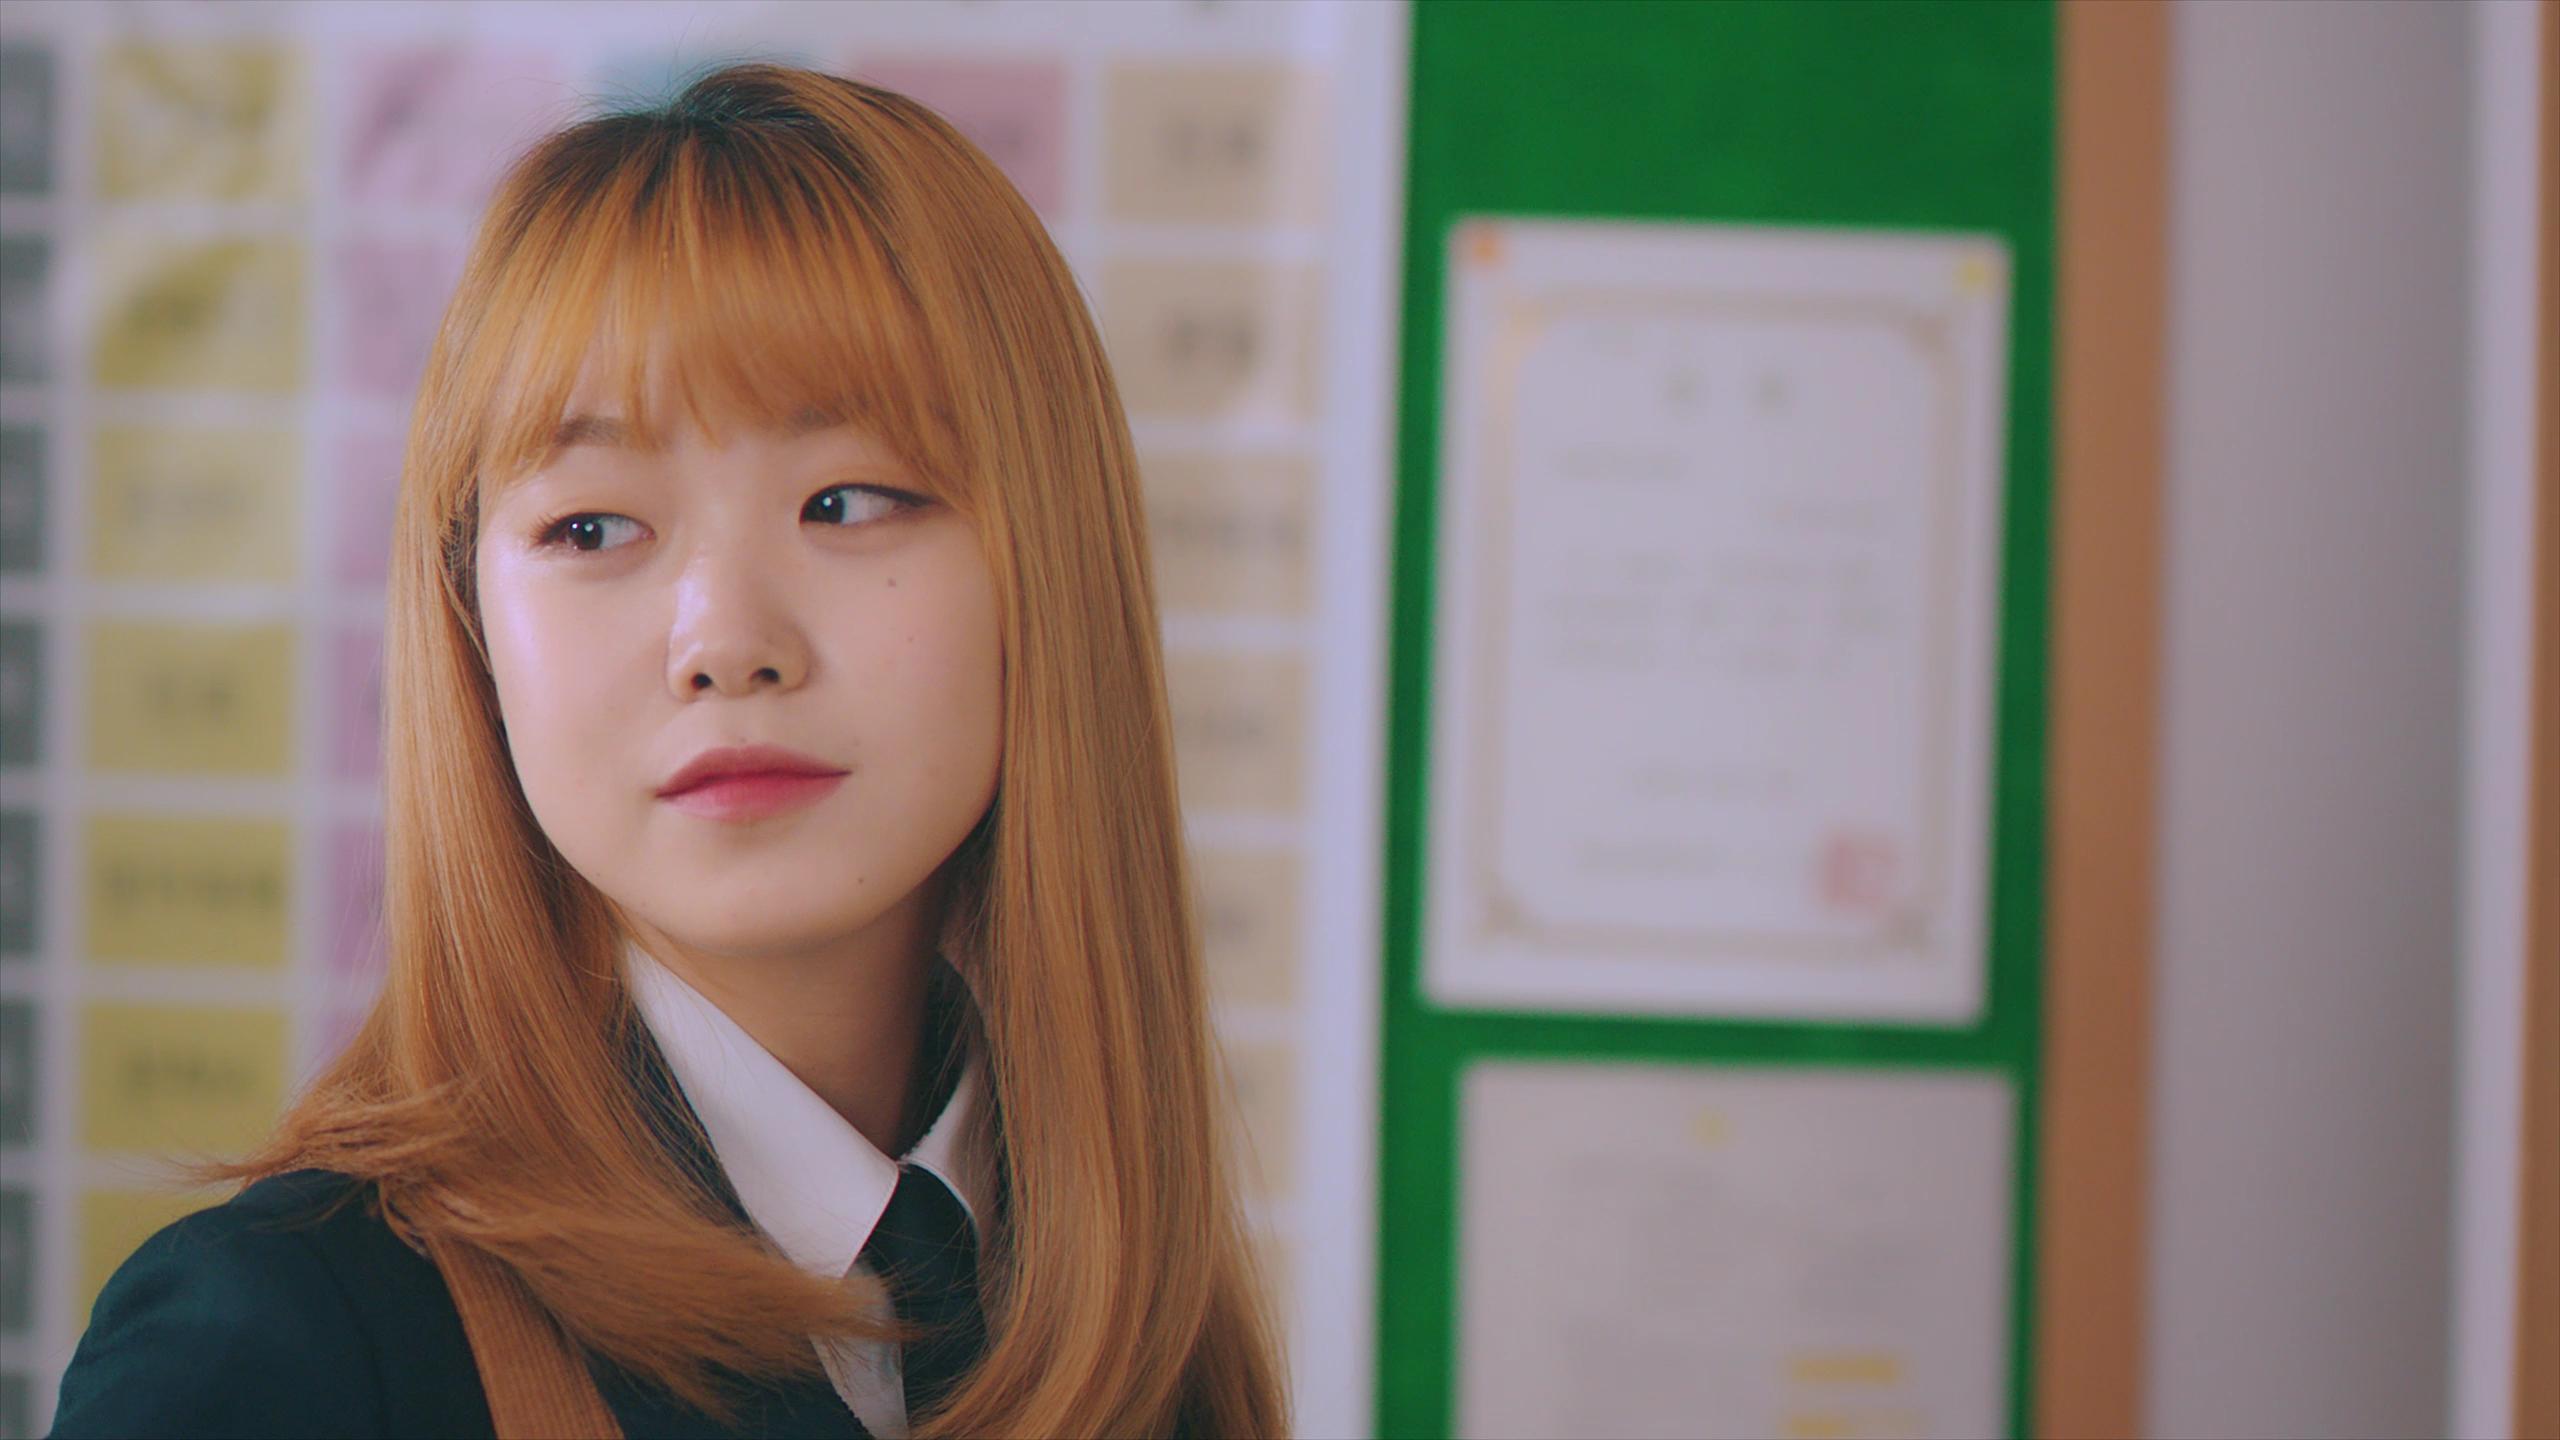 [MV] 2018 월간 윤종신 11월호 - 벼락치기 (With 유주 of 여자친구)